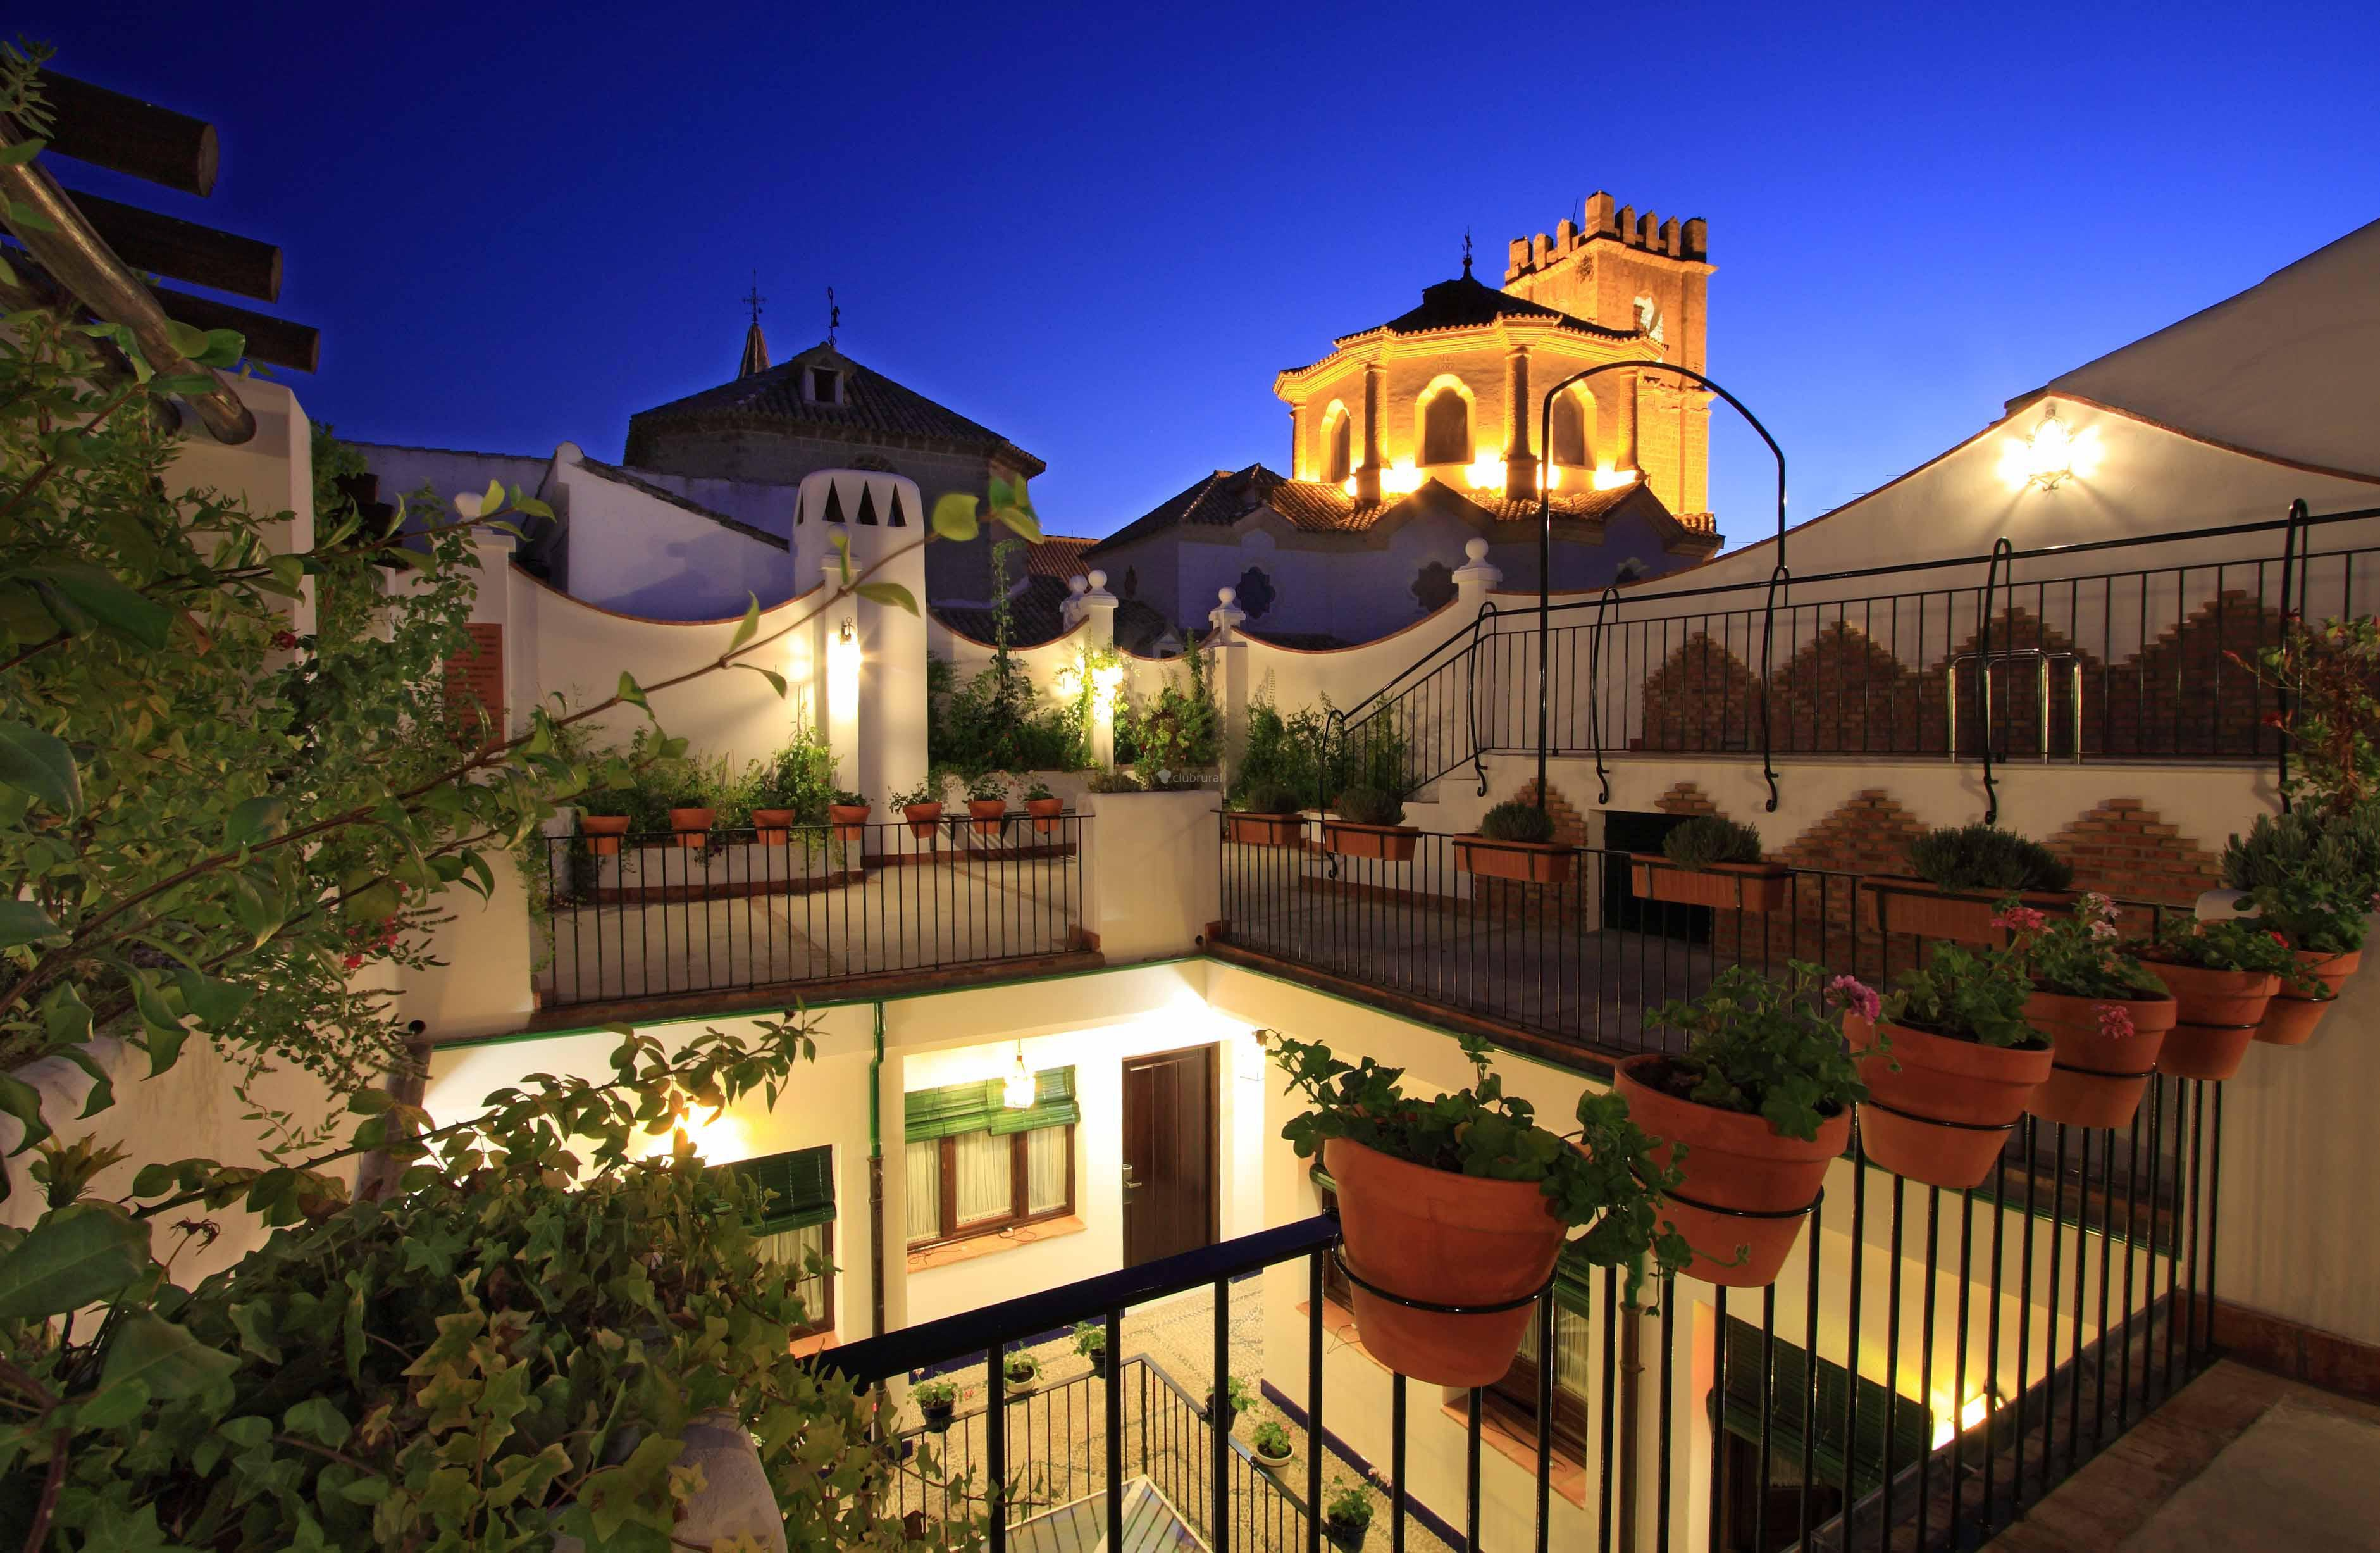 Fotos de casa ba os de la villa c rdoba priego de cordoba clubrural - Banos arabes cordoba opiniones ...